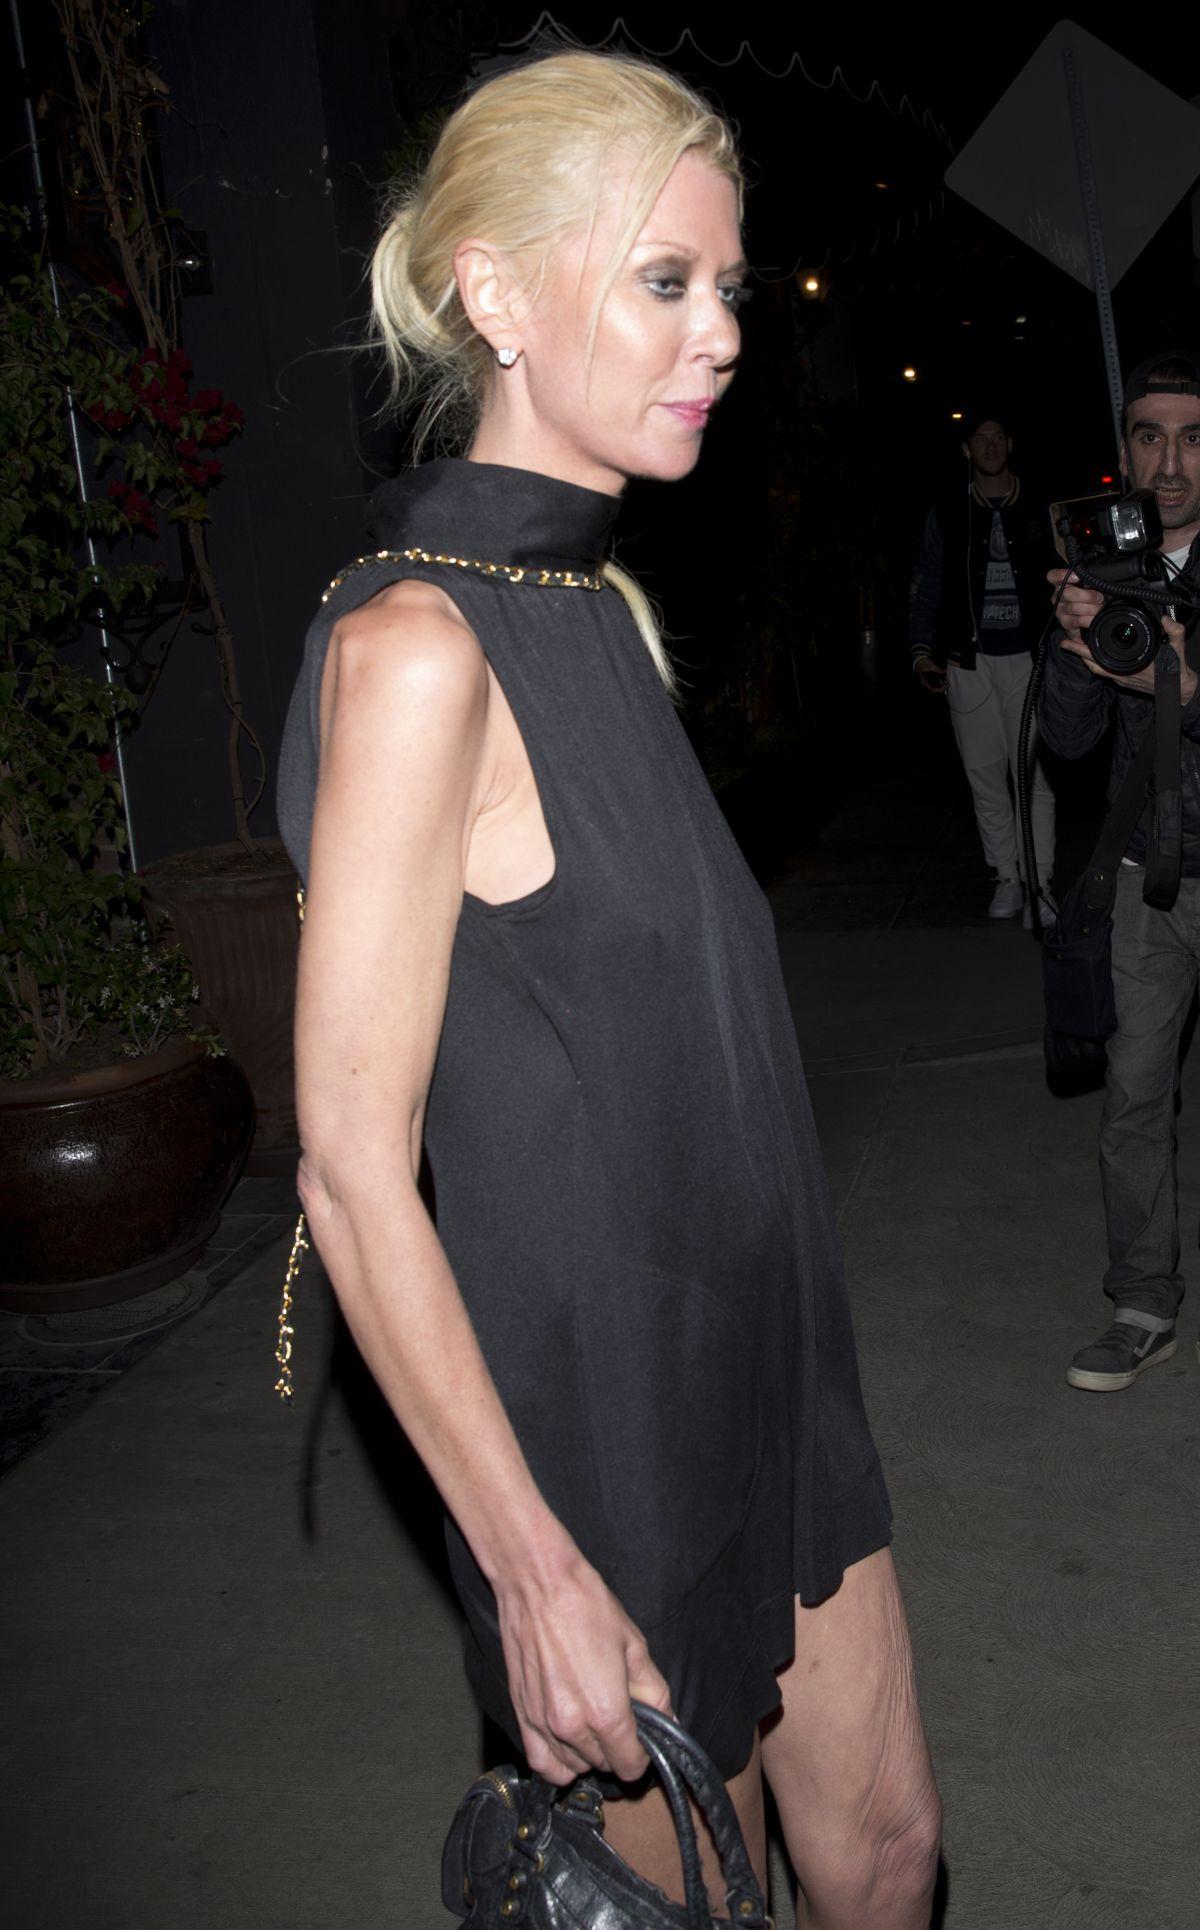 TARA REID at Beauty & Essex in Hollywood 05/30/2017 ...